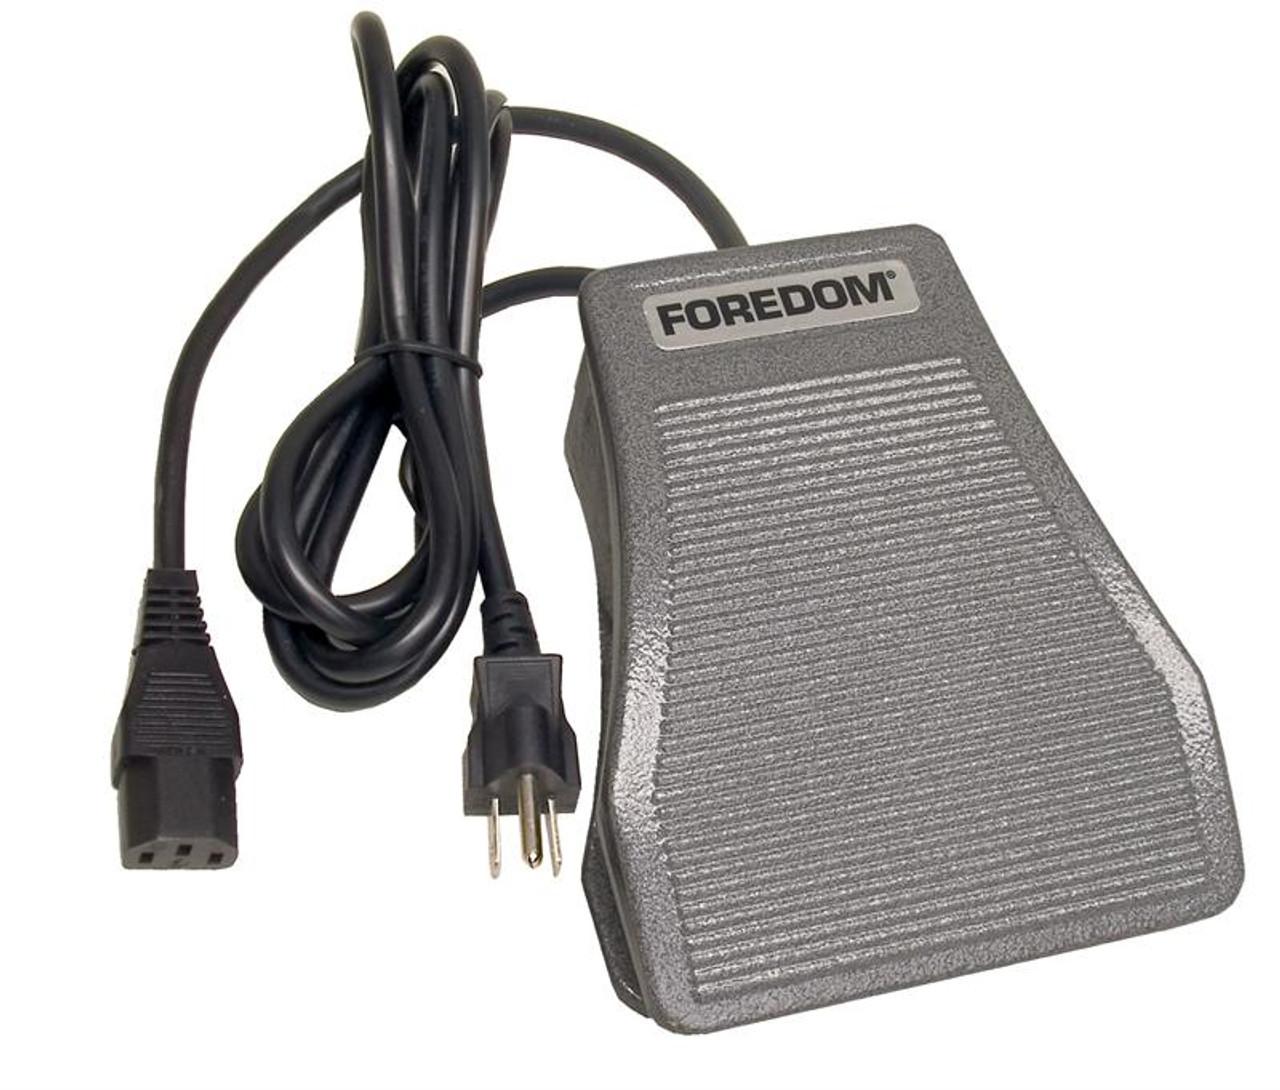 Foredom C.SXR-1 Foot Control, 115 Volt